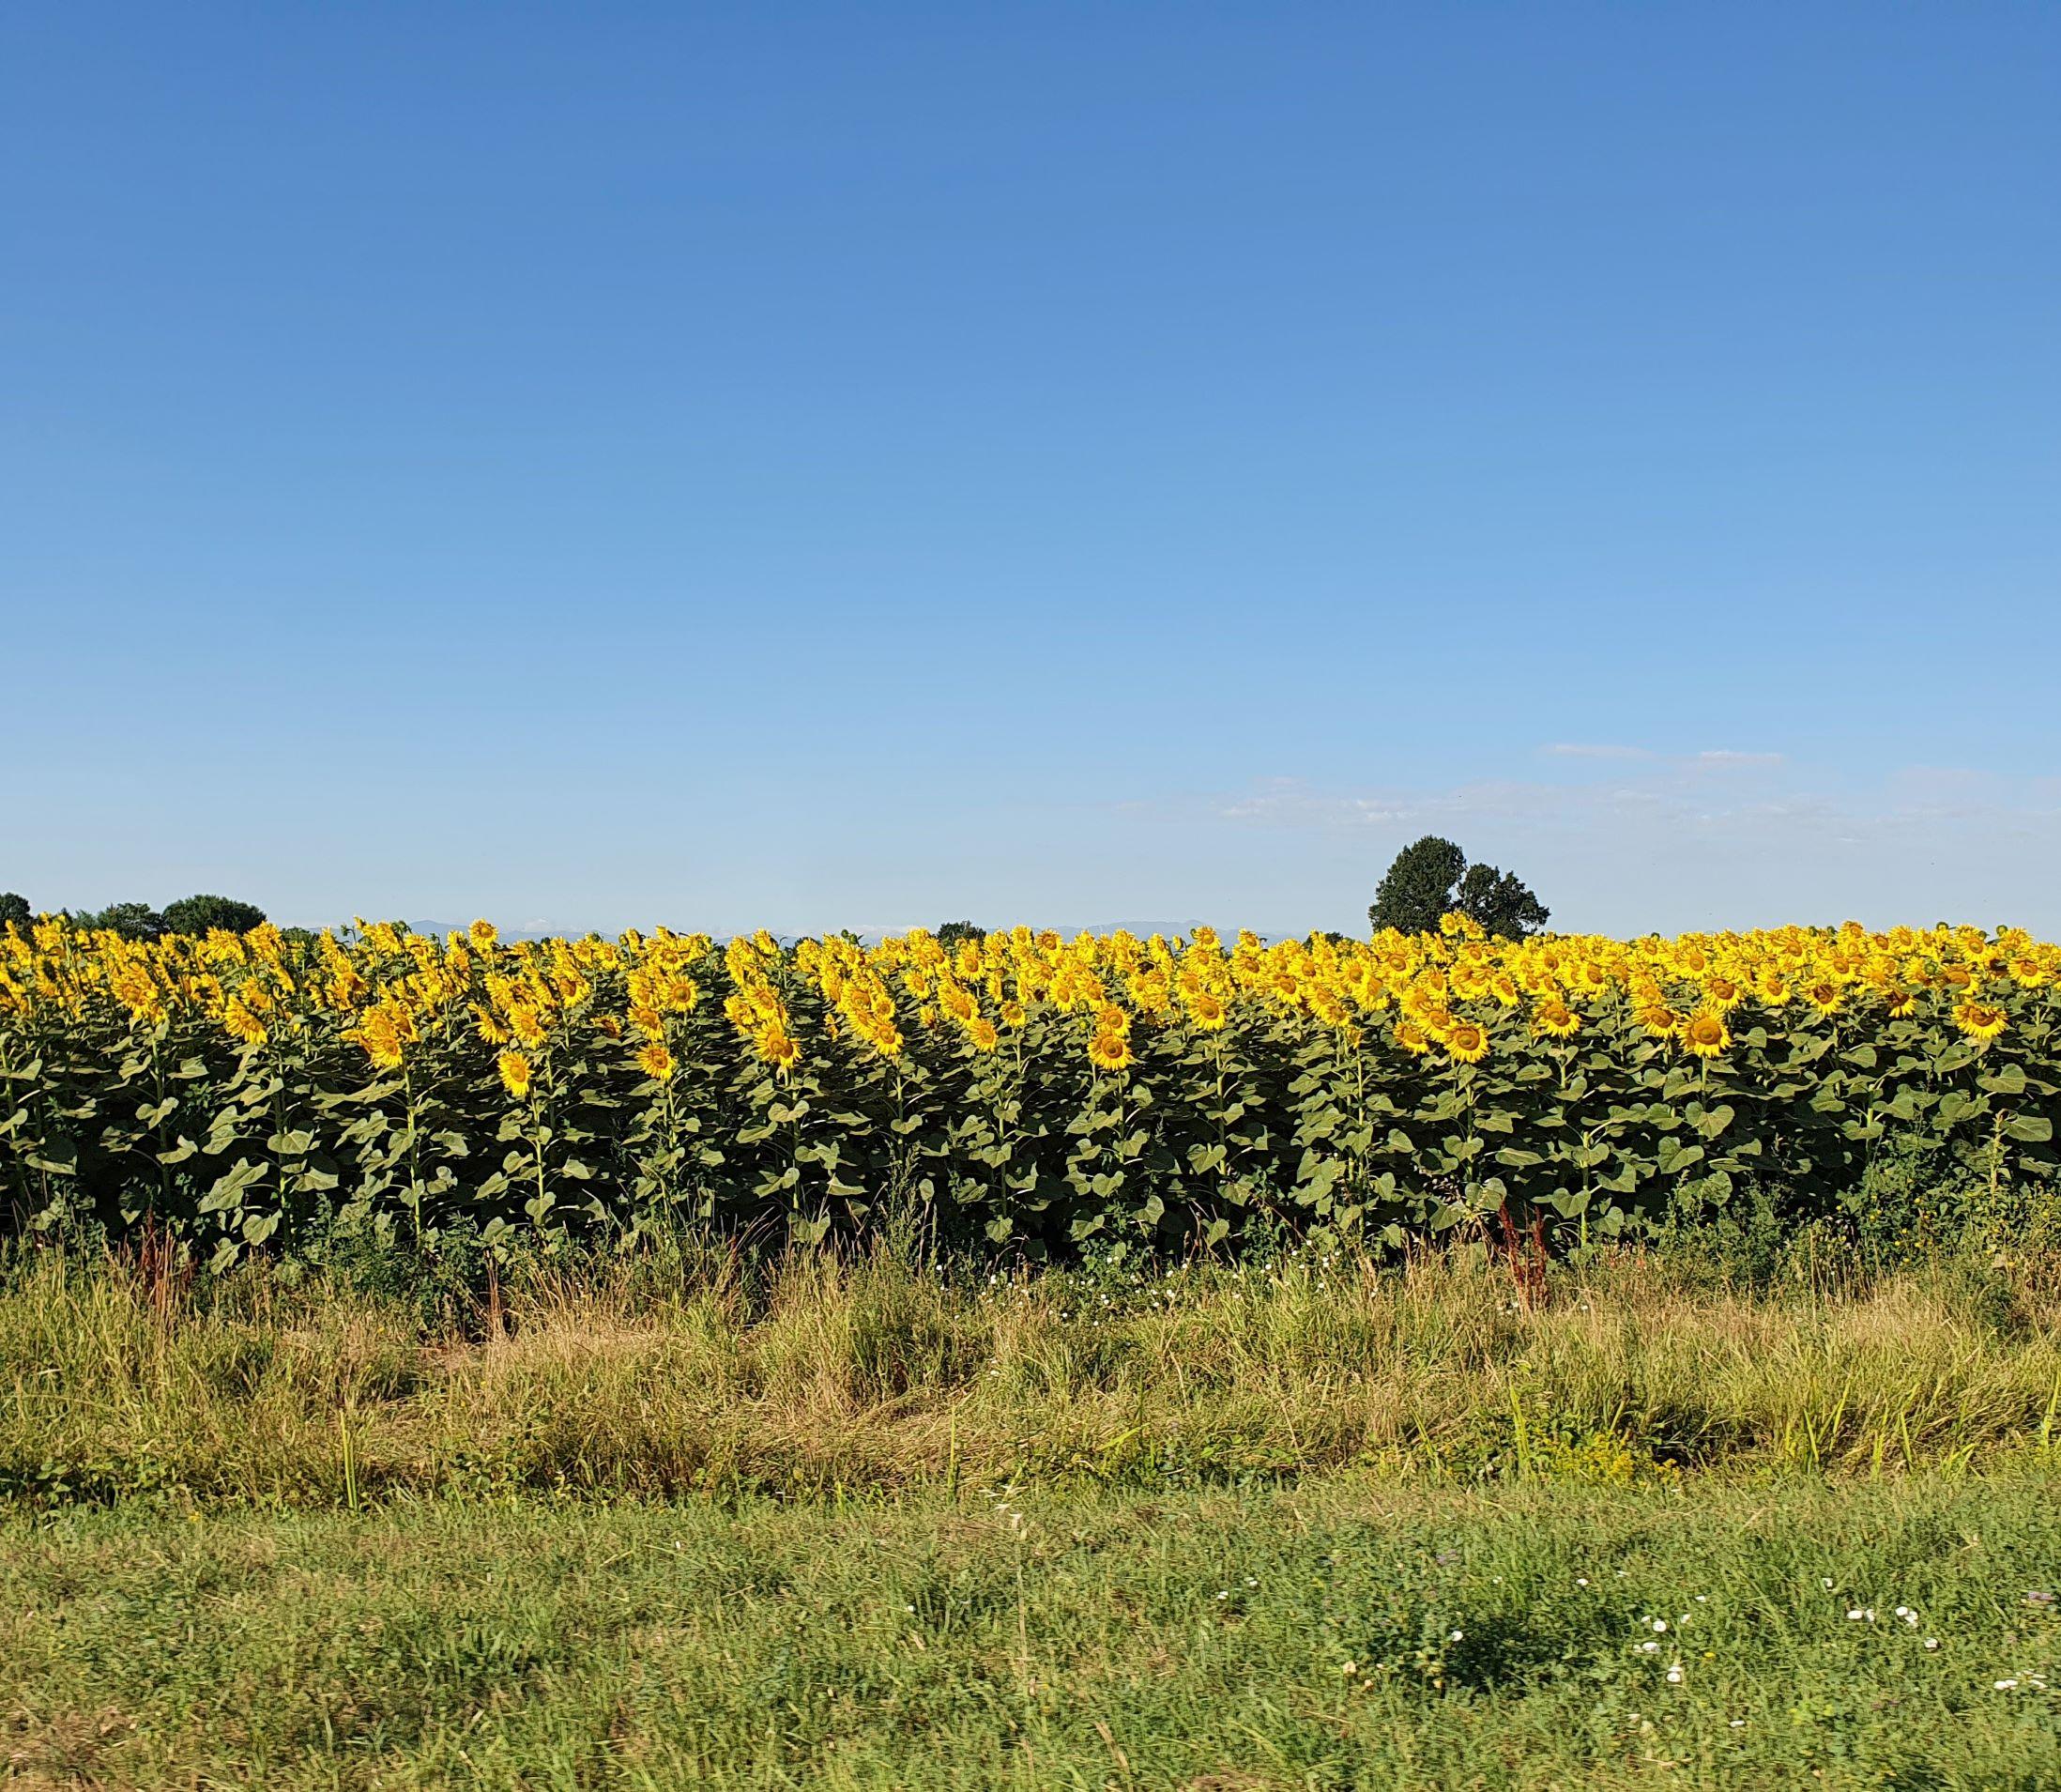 Osteriola countryside - sunflowers - Luglio 2021 - Foto TT